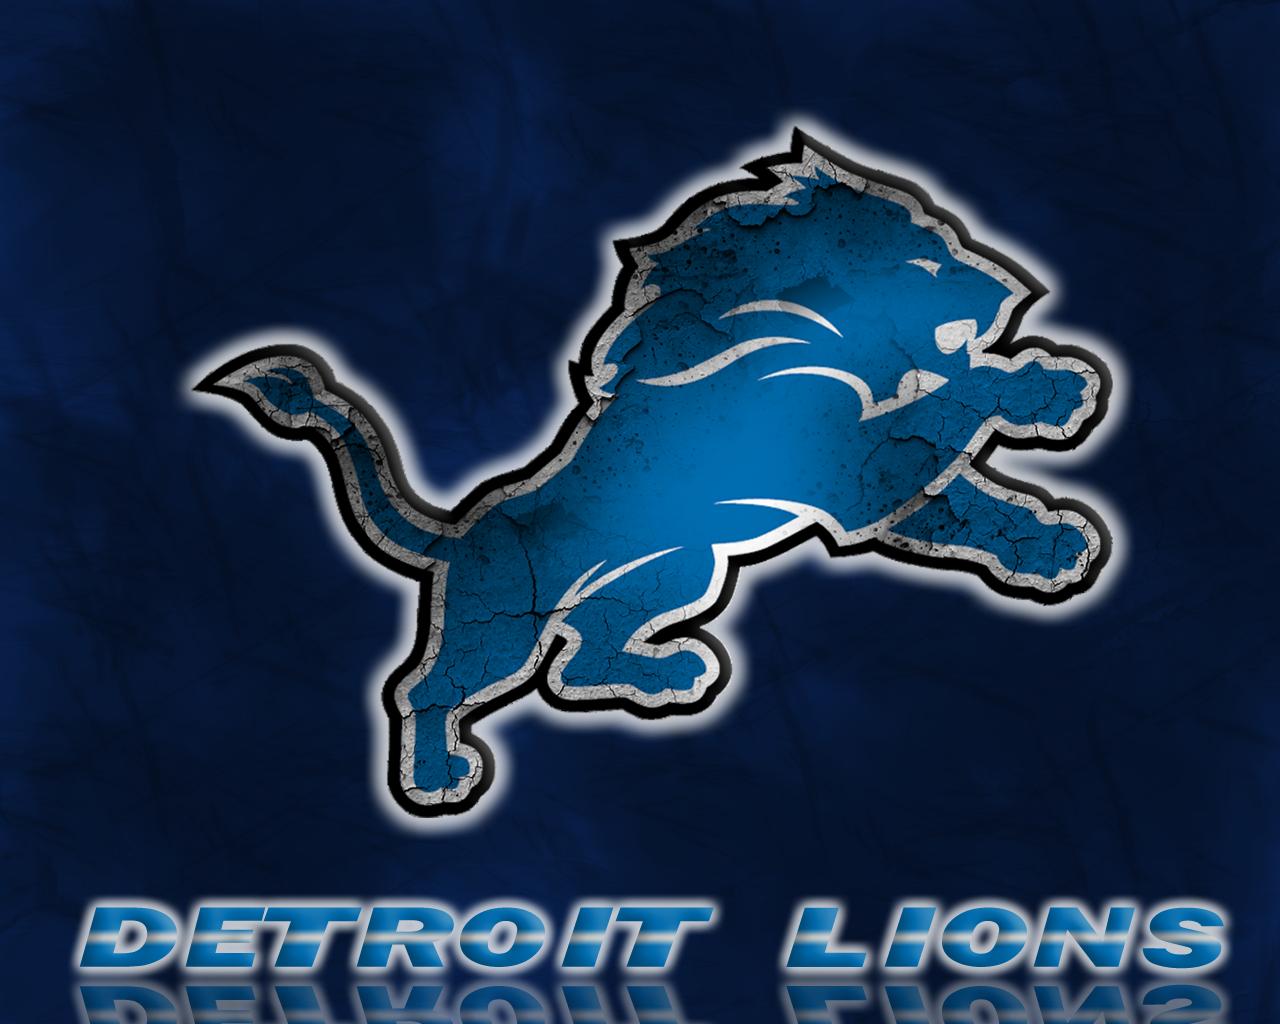 Detroit Lions Wallpaper Detroit Lions Wallpaper By Detroit Lions Wallpaper Detroit Lions Logo Detroit Lions